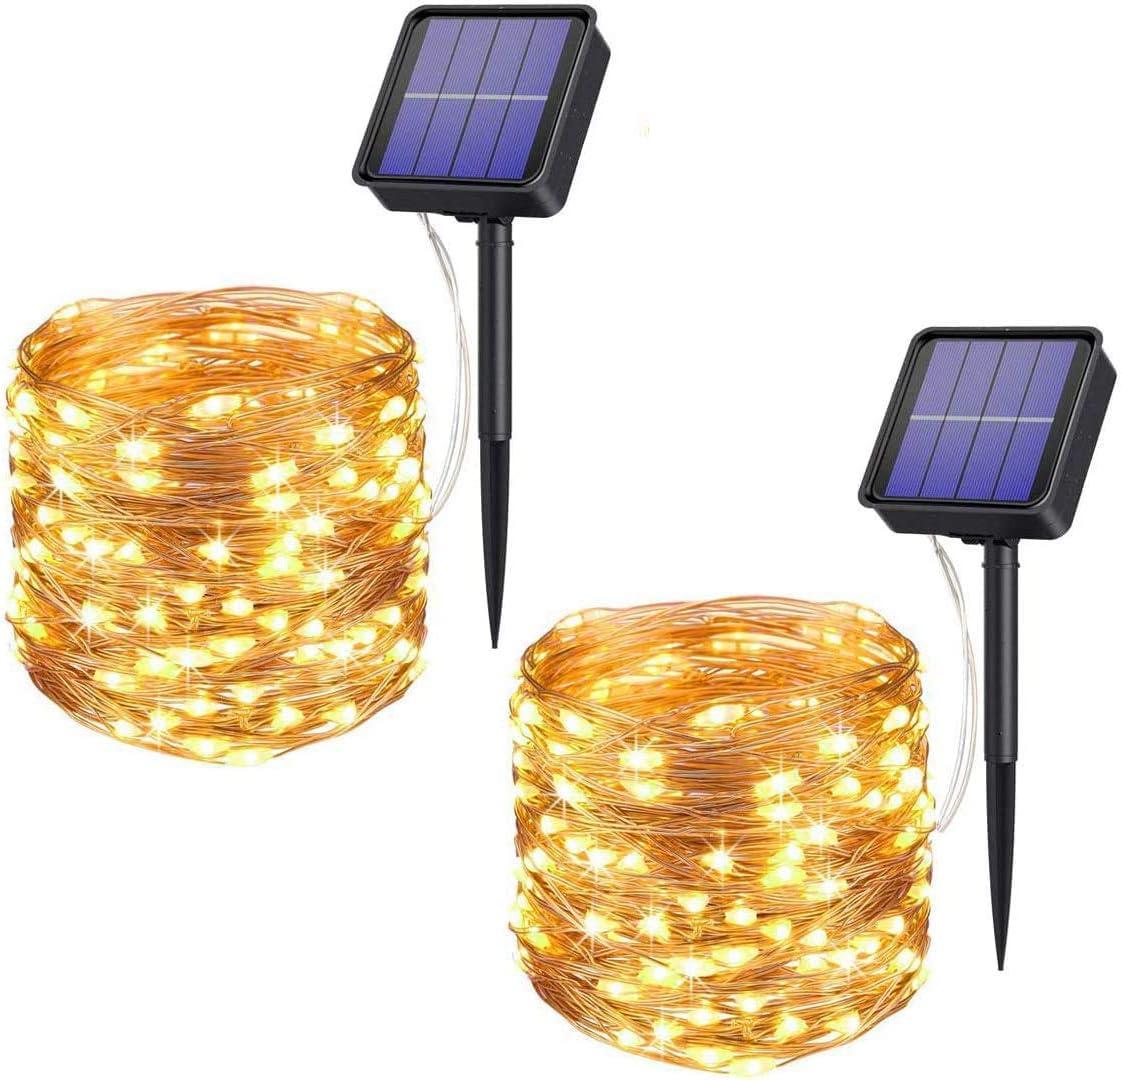 Upoom [2 Pack] Solar Fairy Lights, 400 LED Outdoor Solar String Lights Garden Copper Wire Decorative Lights 72Ft Waterproof Indoor Outdoor Lighting for Garden, Patio, Yard, Christmas